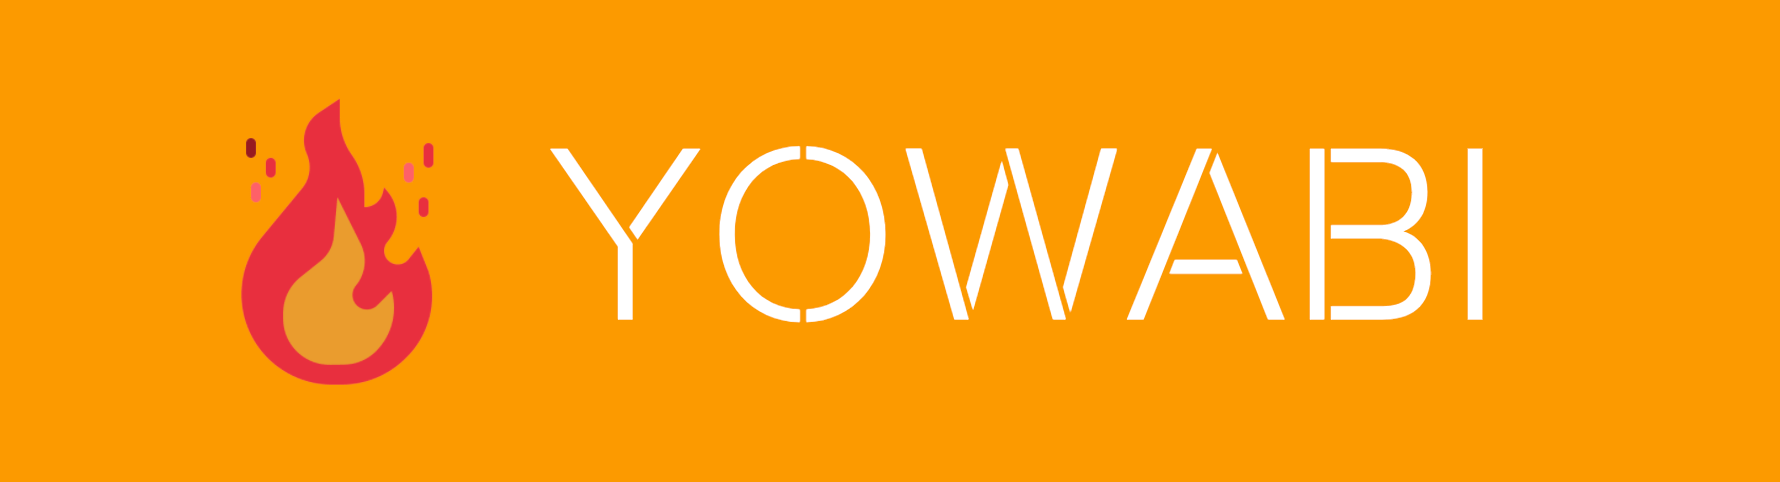 YOWABI